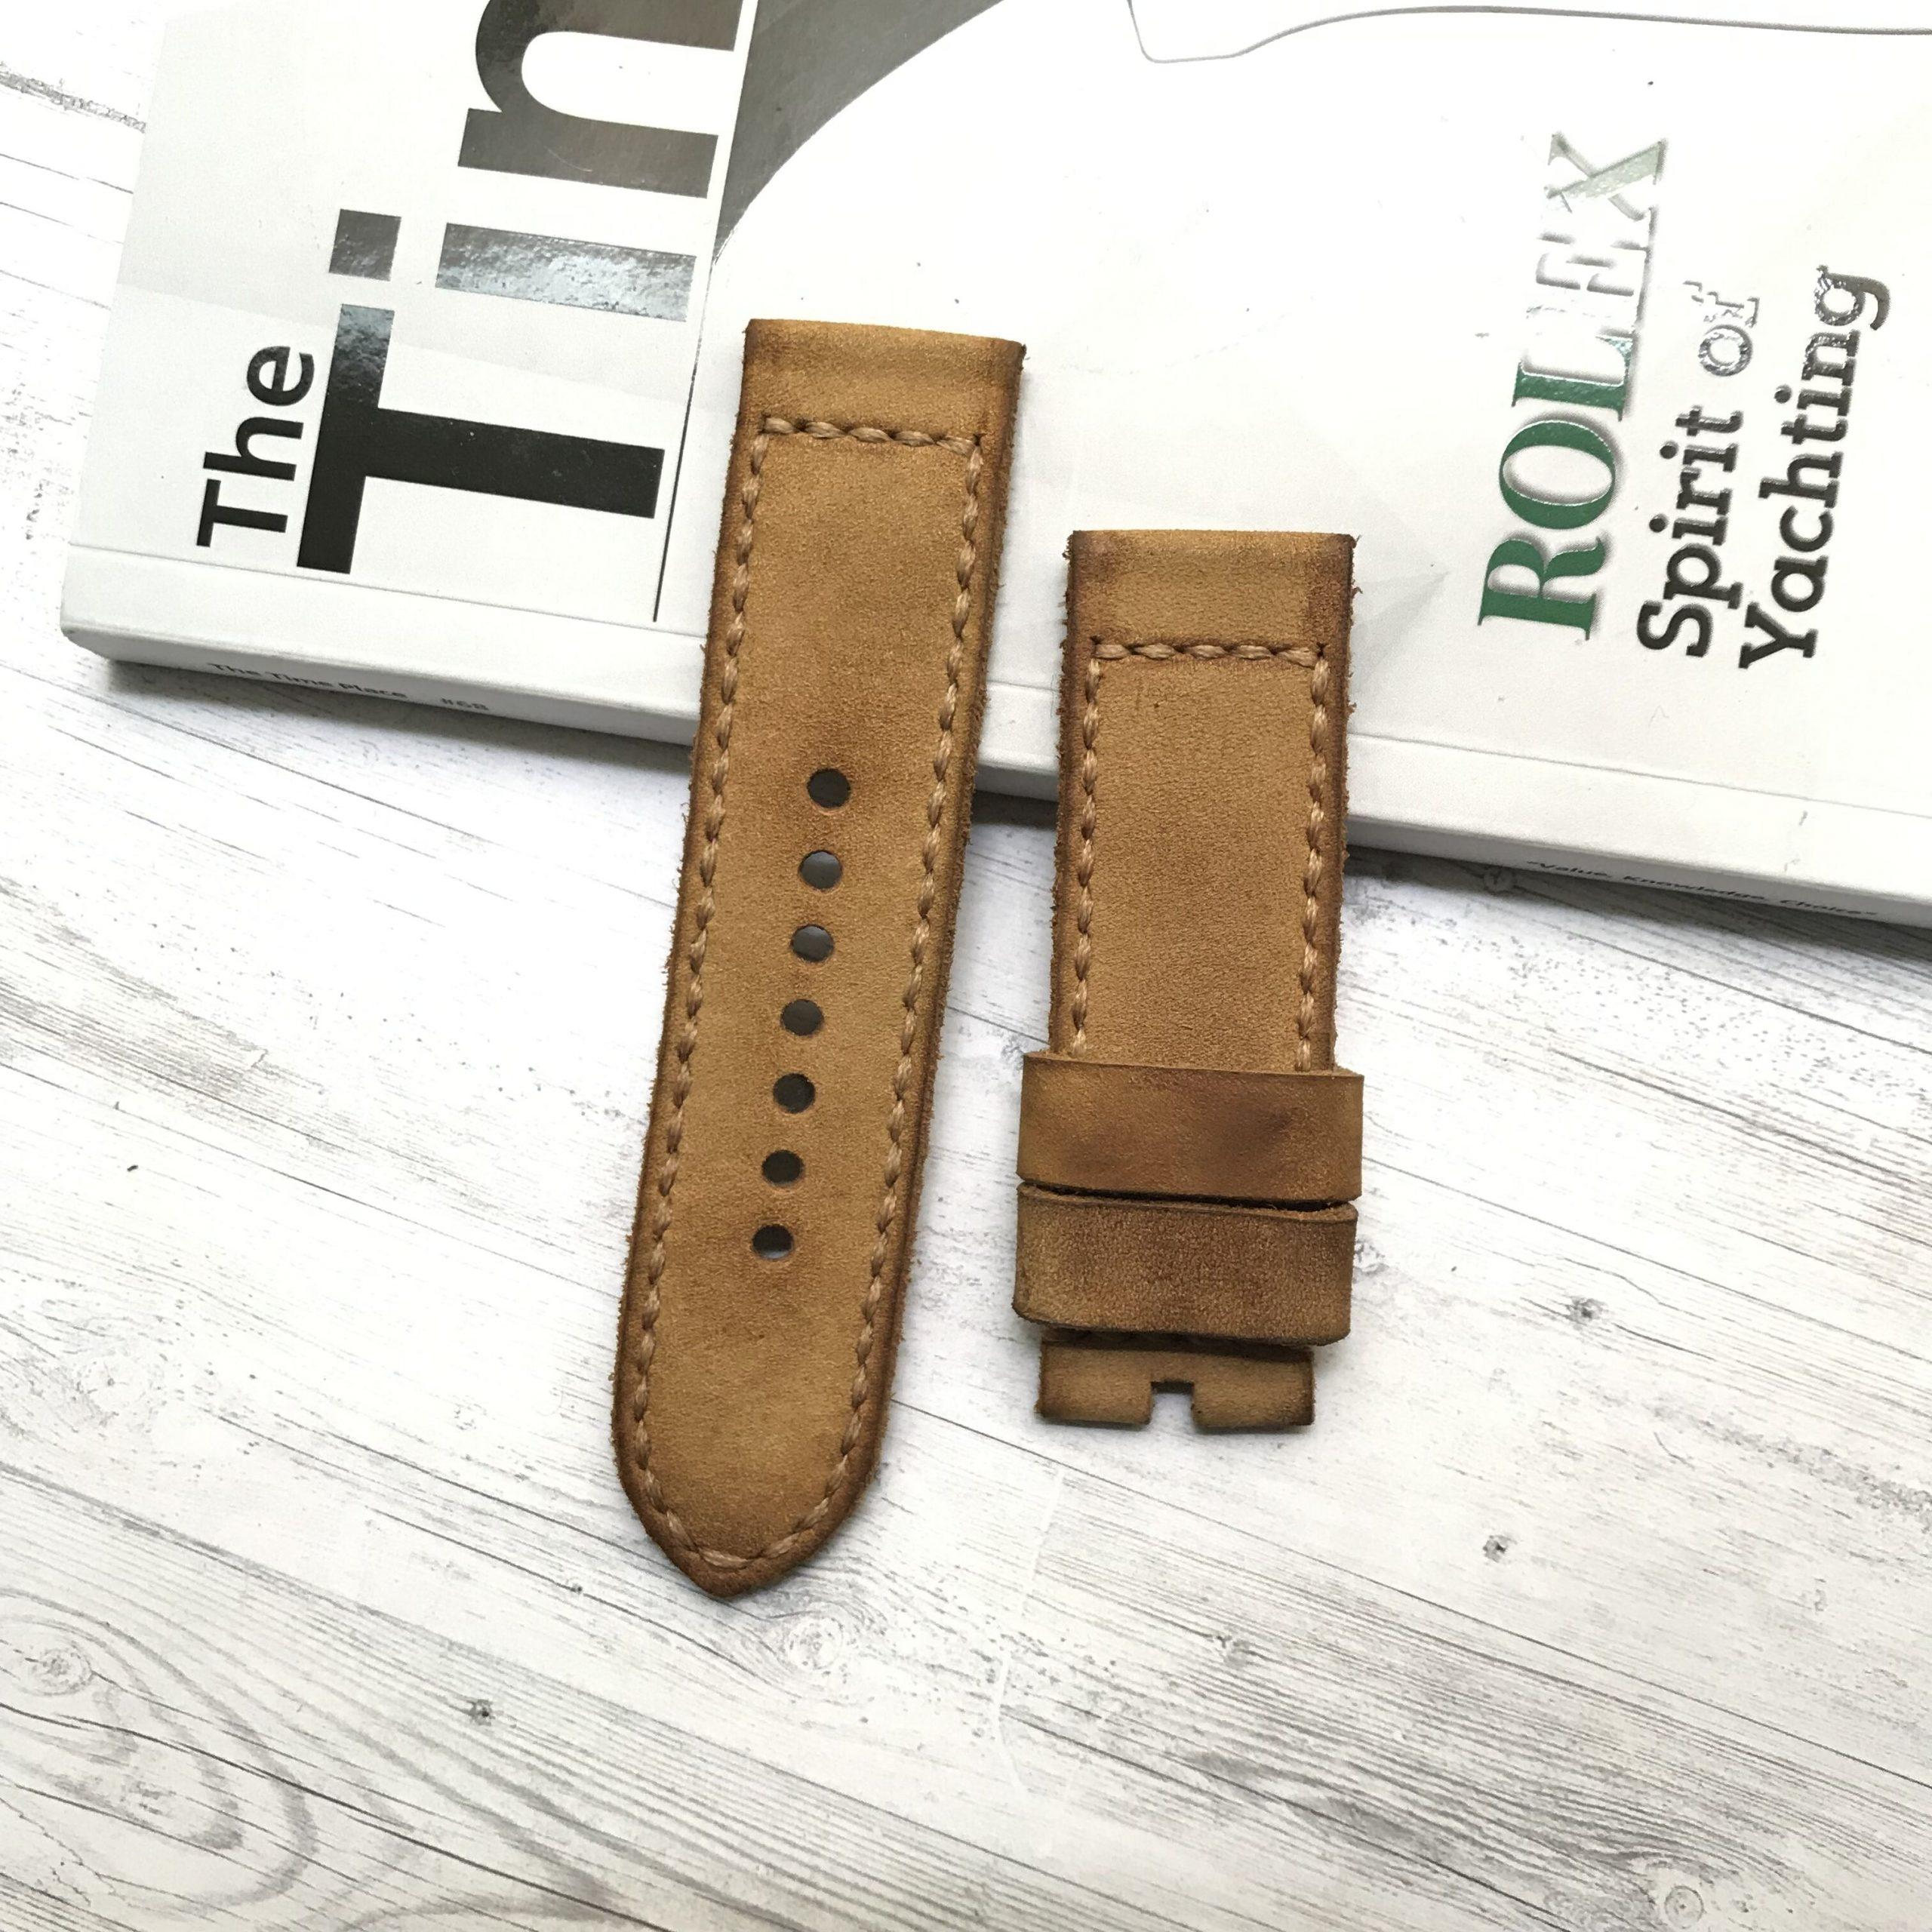 porteur-straps-macaire-strapsonly